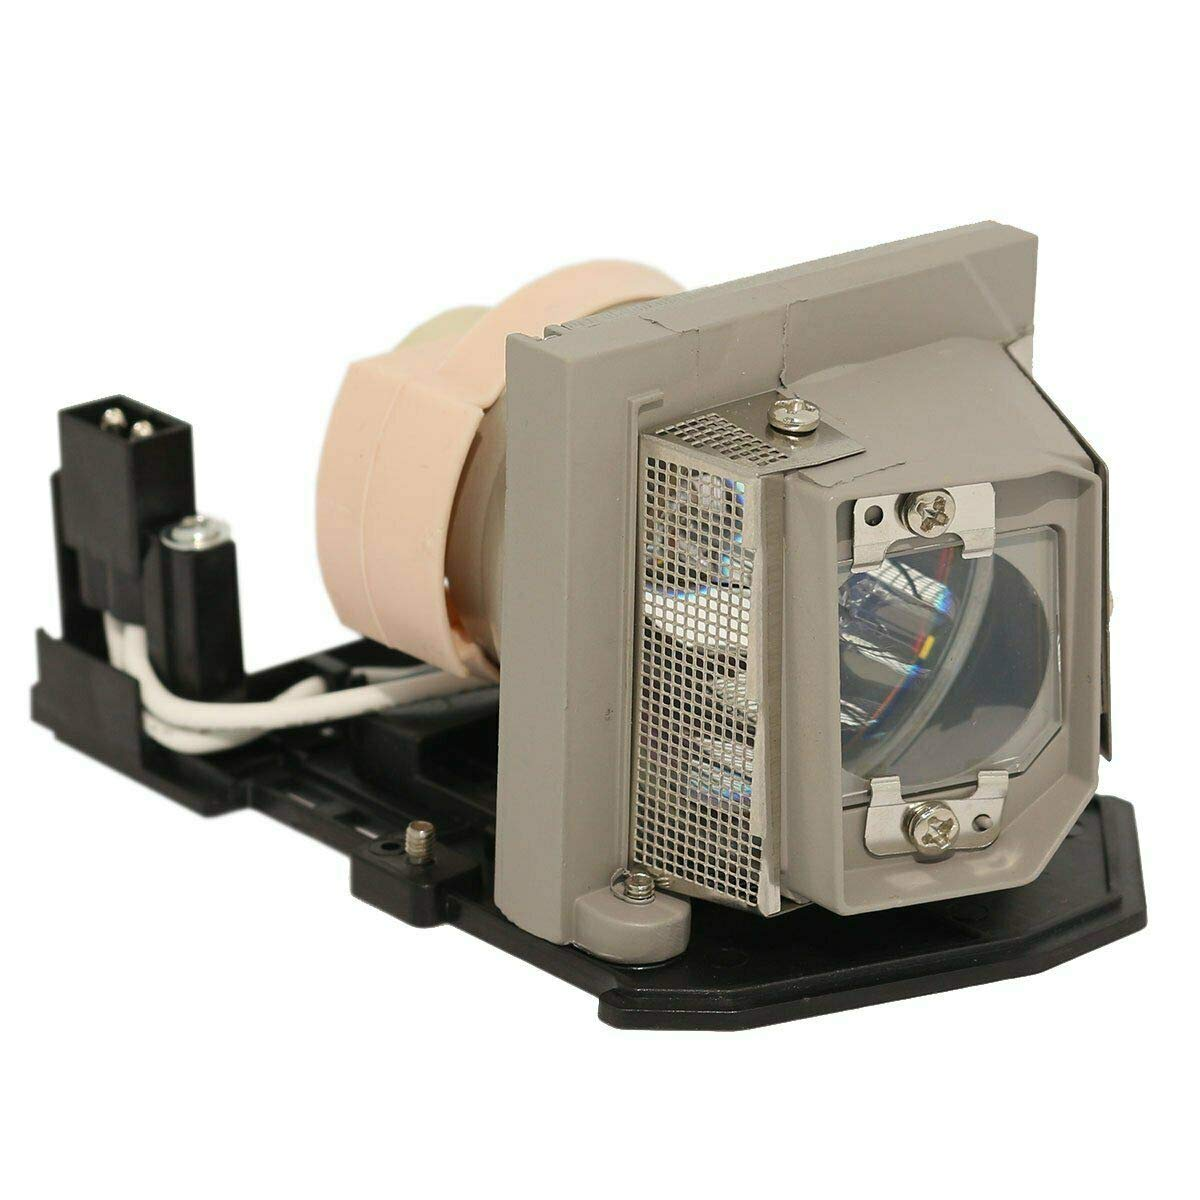 CTLAMP BL-FP190B / SP.8VF01GC01 プロフェッショナル互換プロジェクターランプ BL-FP190B / SP.8VF01GC01 ハウジング付き交換用電球 OPTOMA X301 / DX3246 / DW326e / H180X / W301 / DX326と互換性あり   B07QY7DWL7